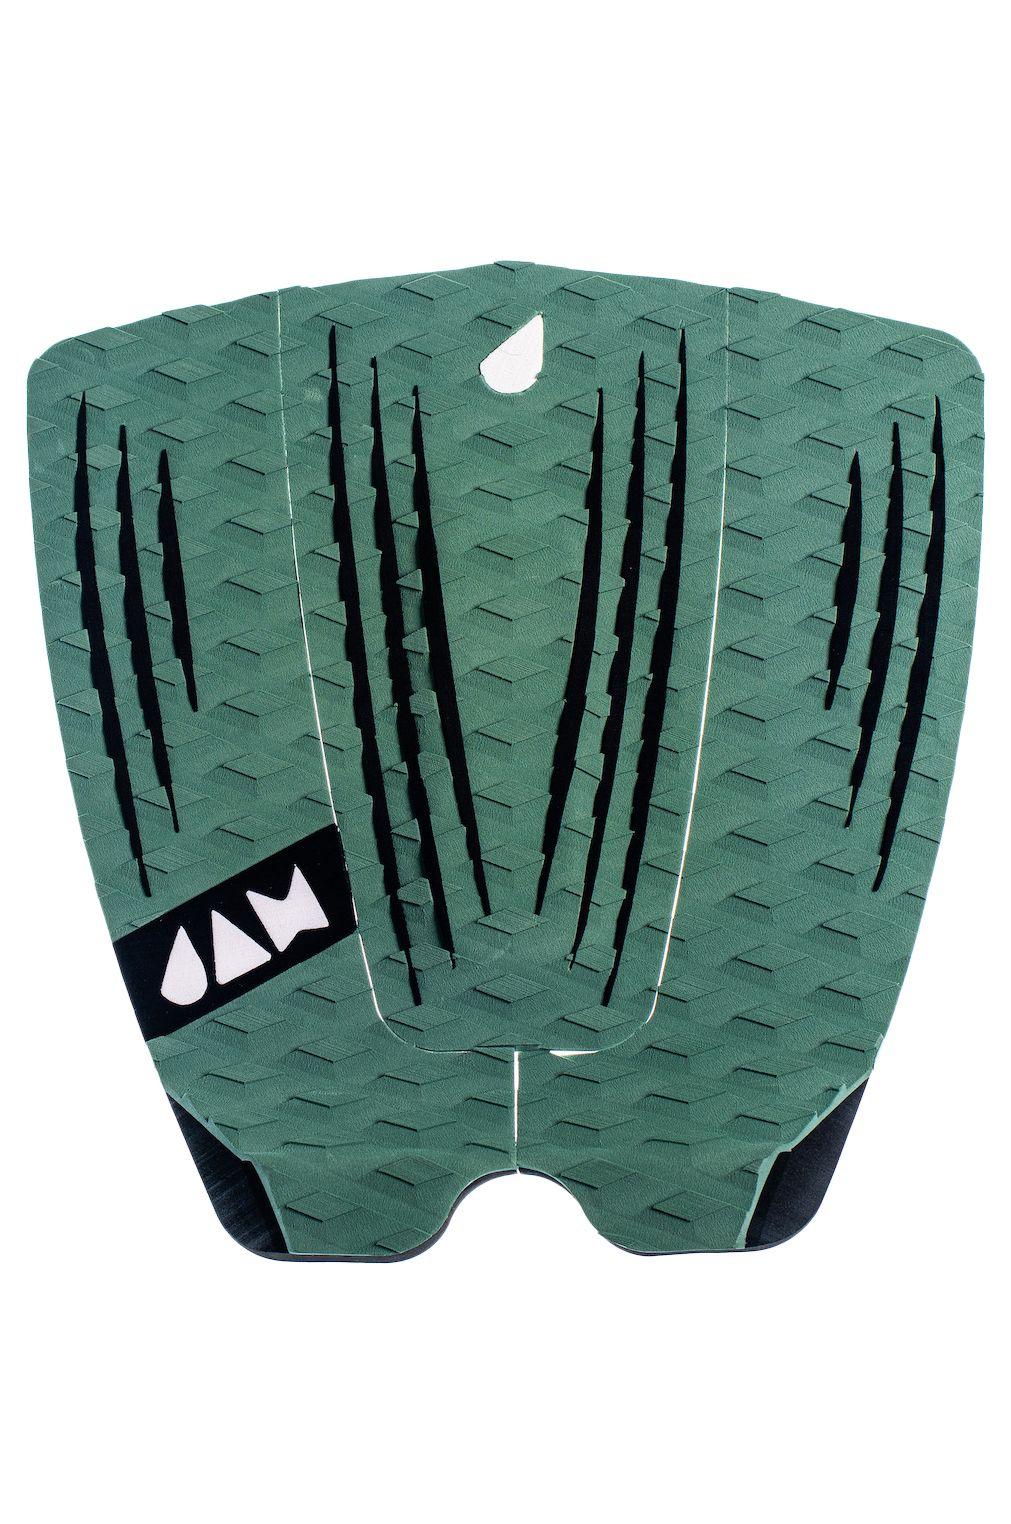 Jam Deck RECKLESS 3 PIECE Army Green/Black Stripes